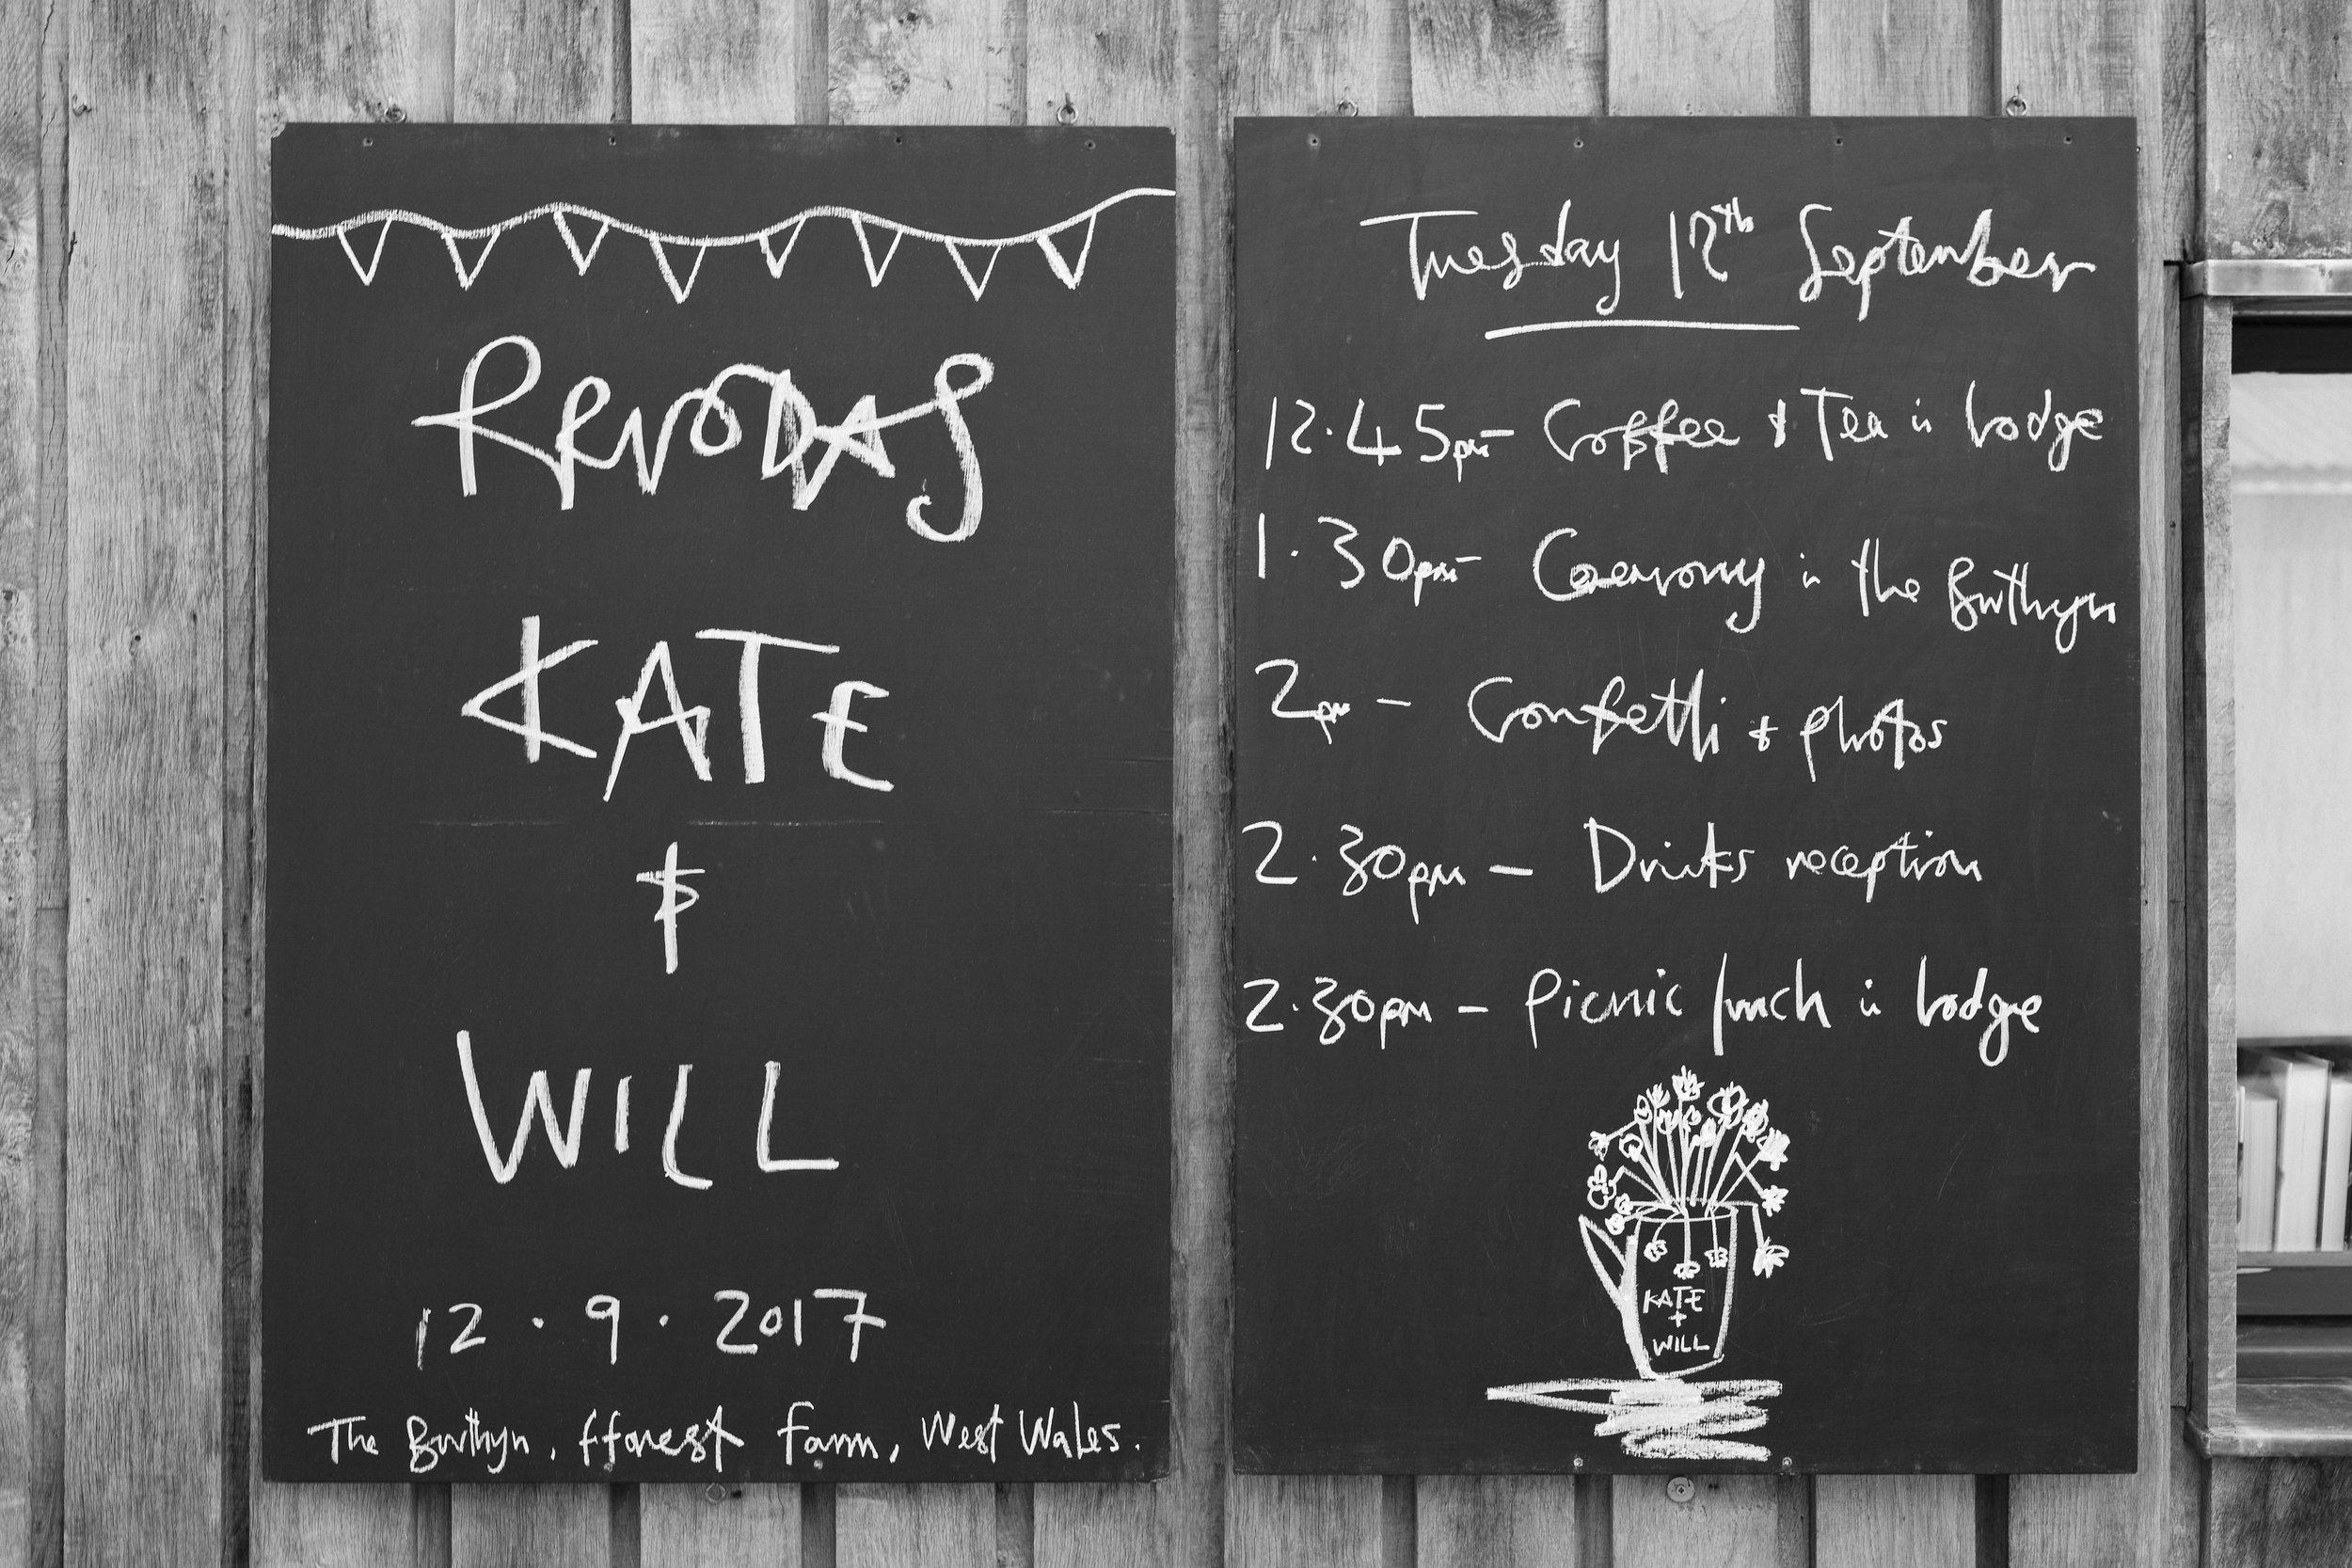 Kate_&Will_044.jpg